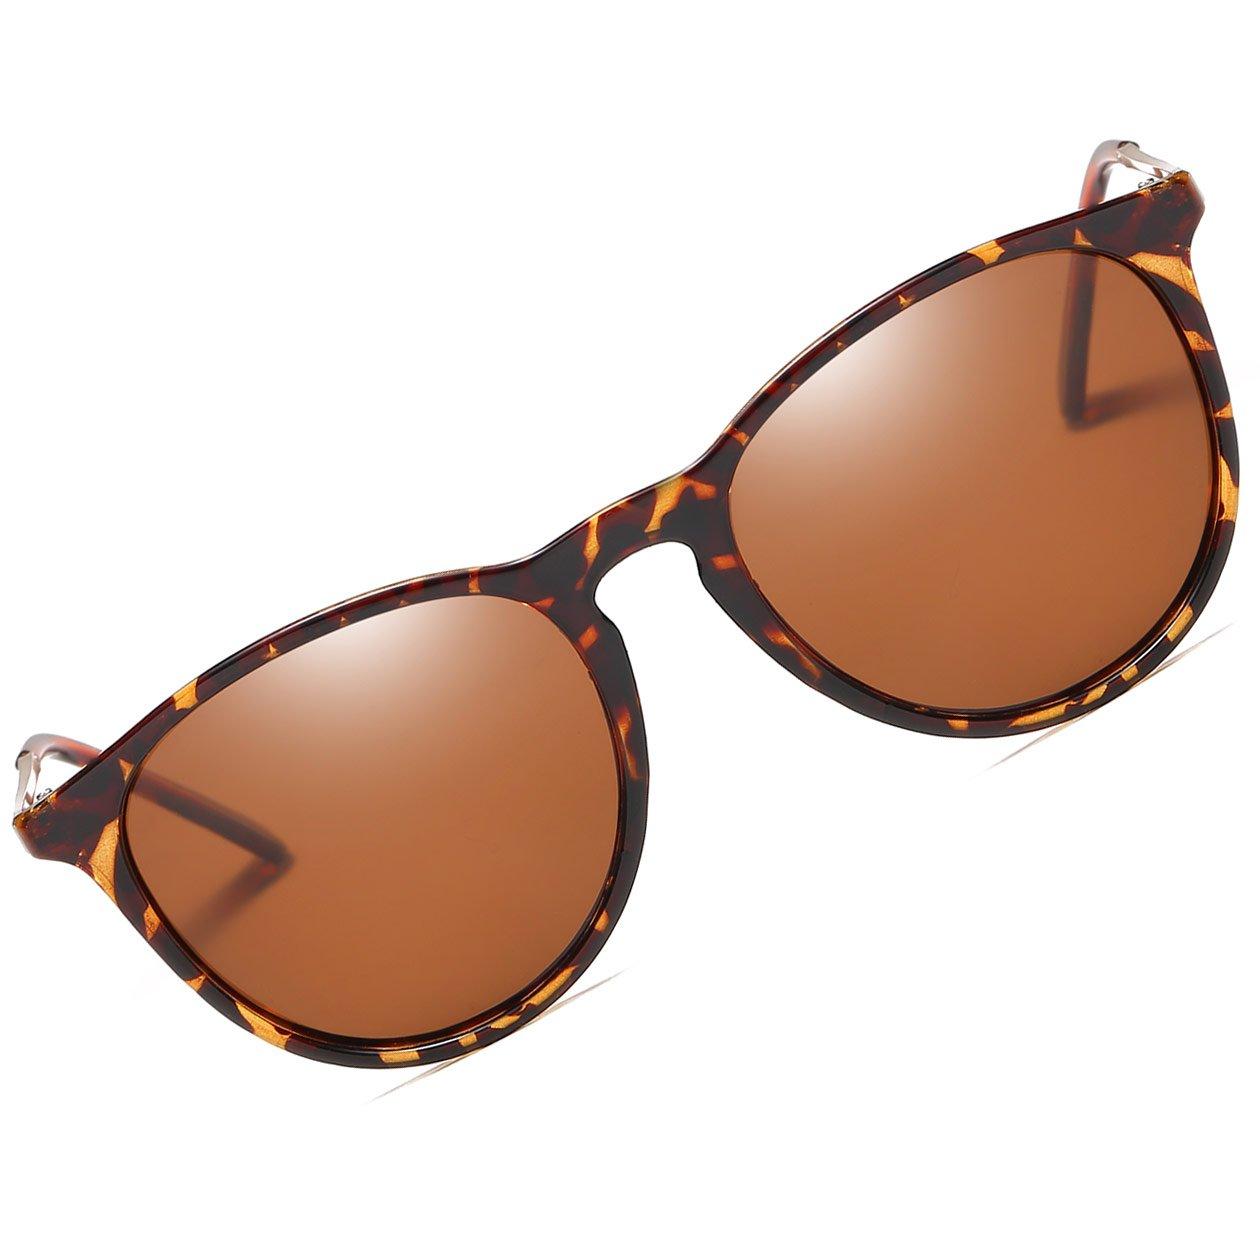 Vintage Round Sunglasses for Women Erika Retro Style Classic Polarized Mens Sunglasses (leopard/Brown)